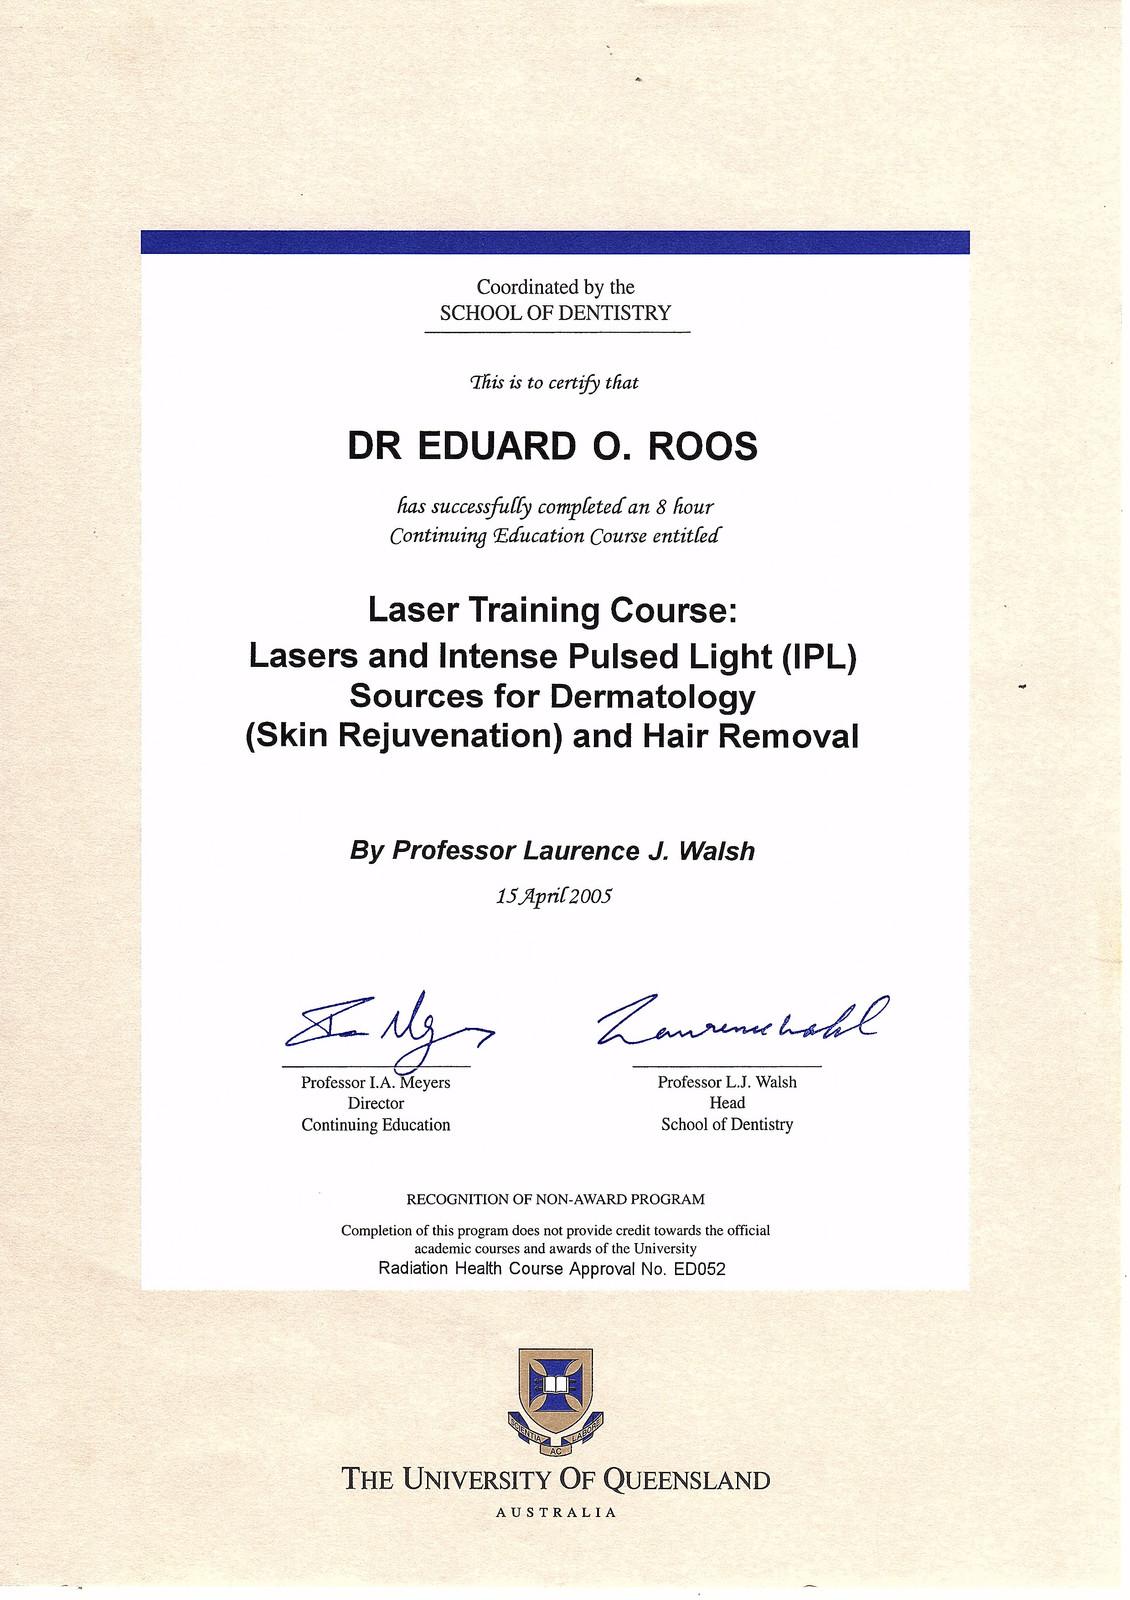 Laser Ipl Certified Dermatology Skin Rejuvenation Hair Removal